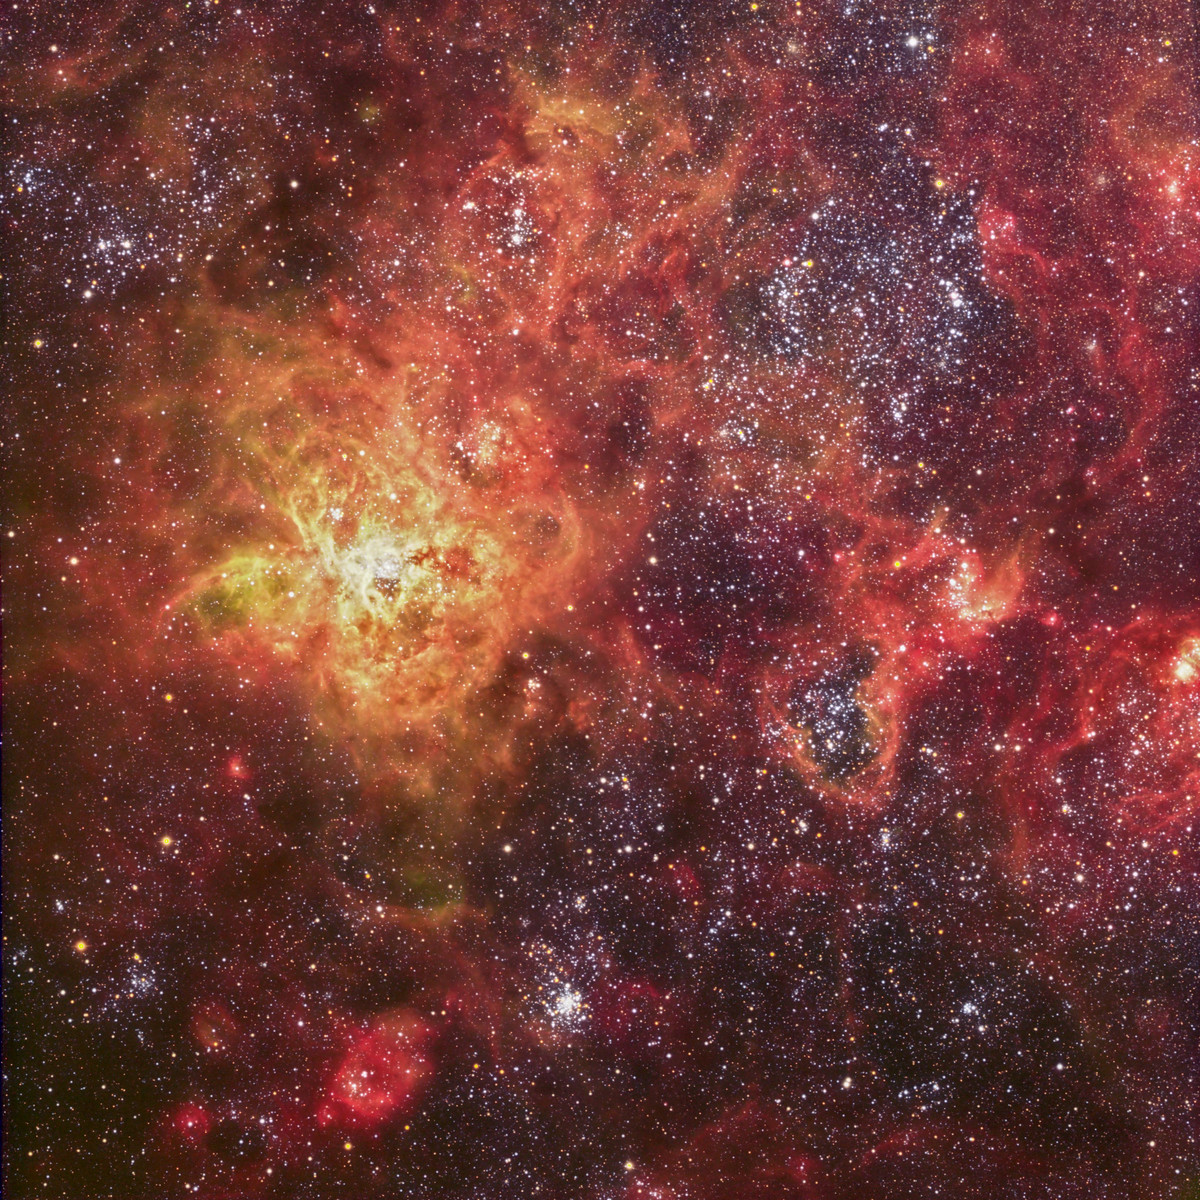 NGC2070, the Tarantula Nebula